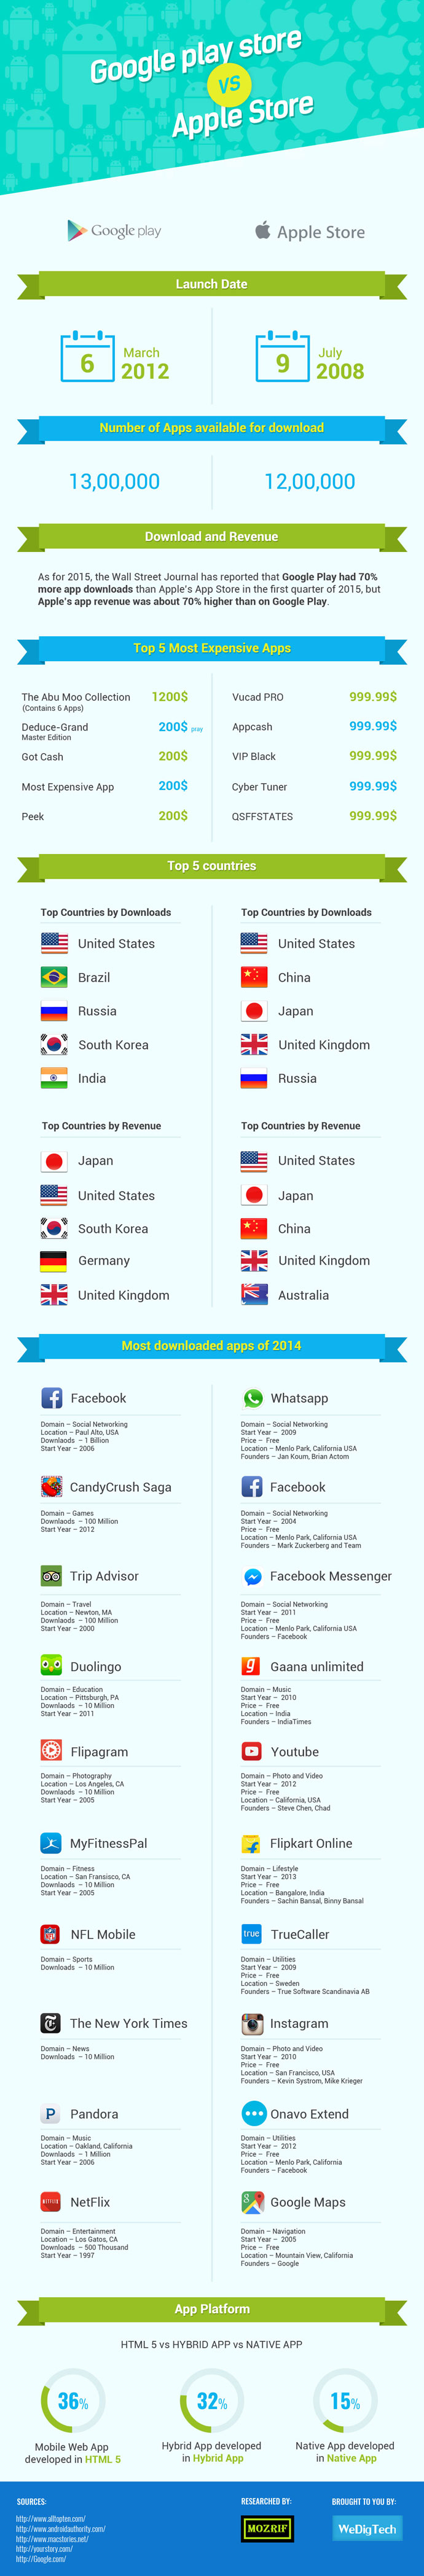 Infographic-Google play store vs Apple app store